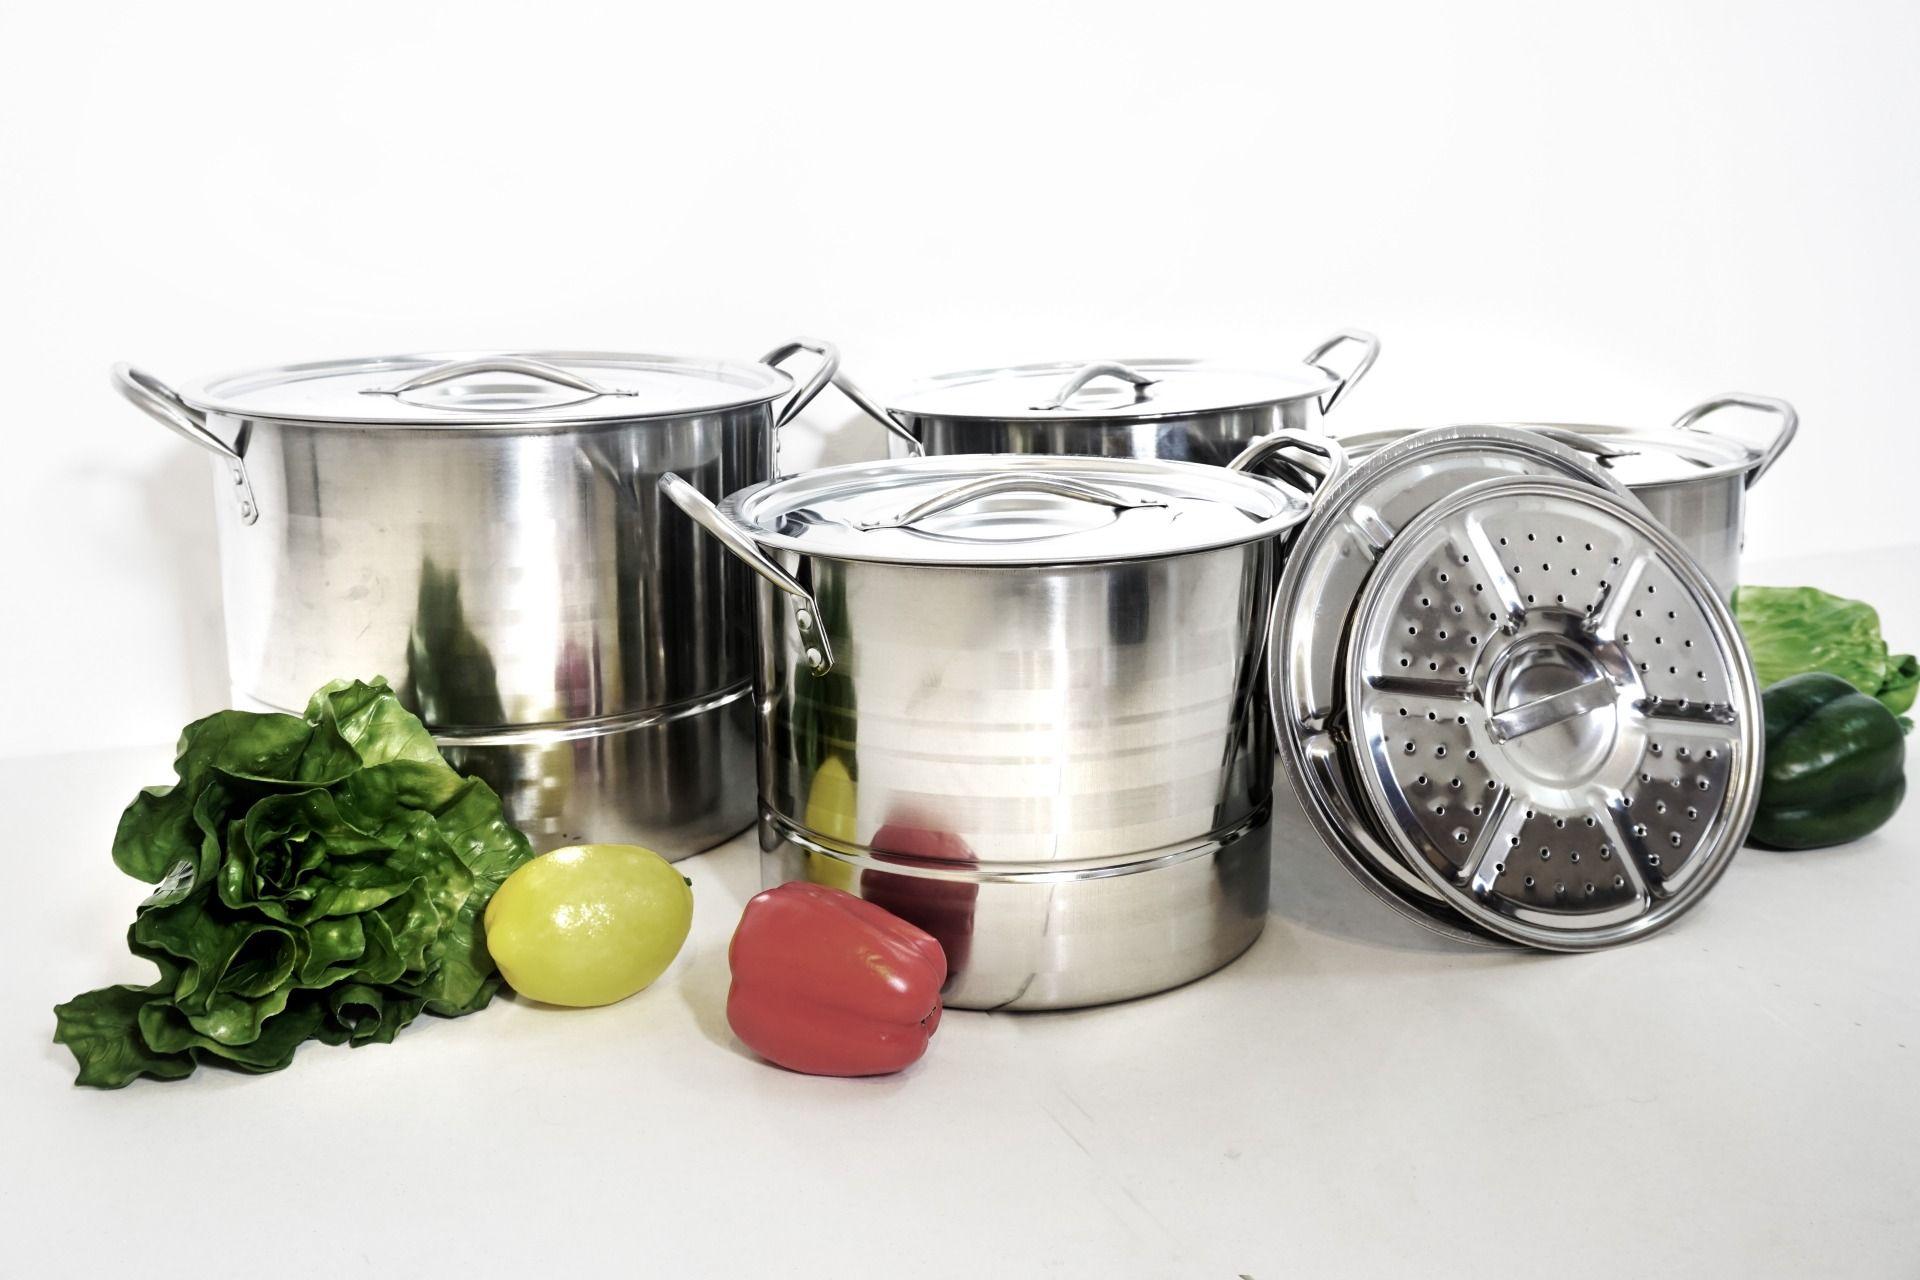 Memilih Stock Pots Steamer yang Tepat untuk Memasak